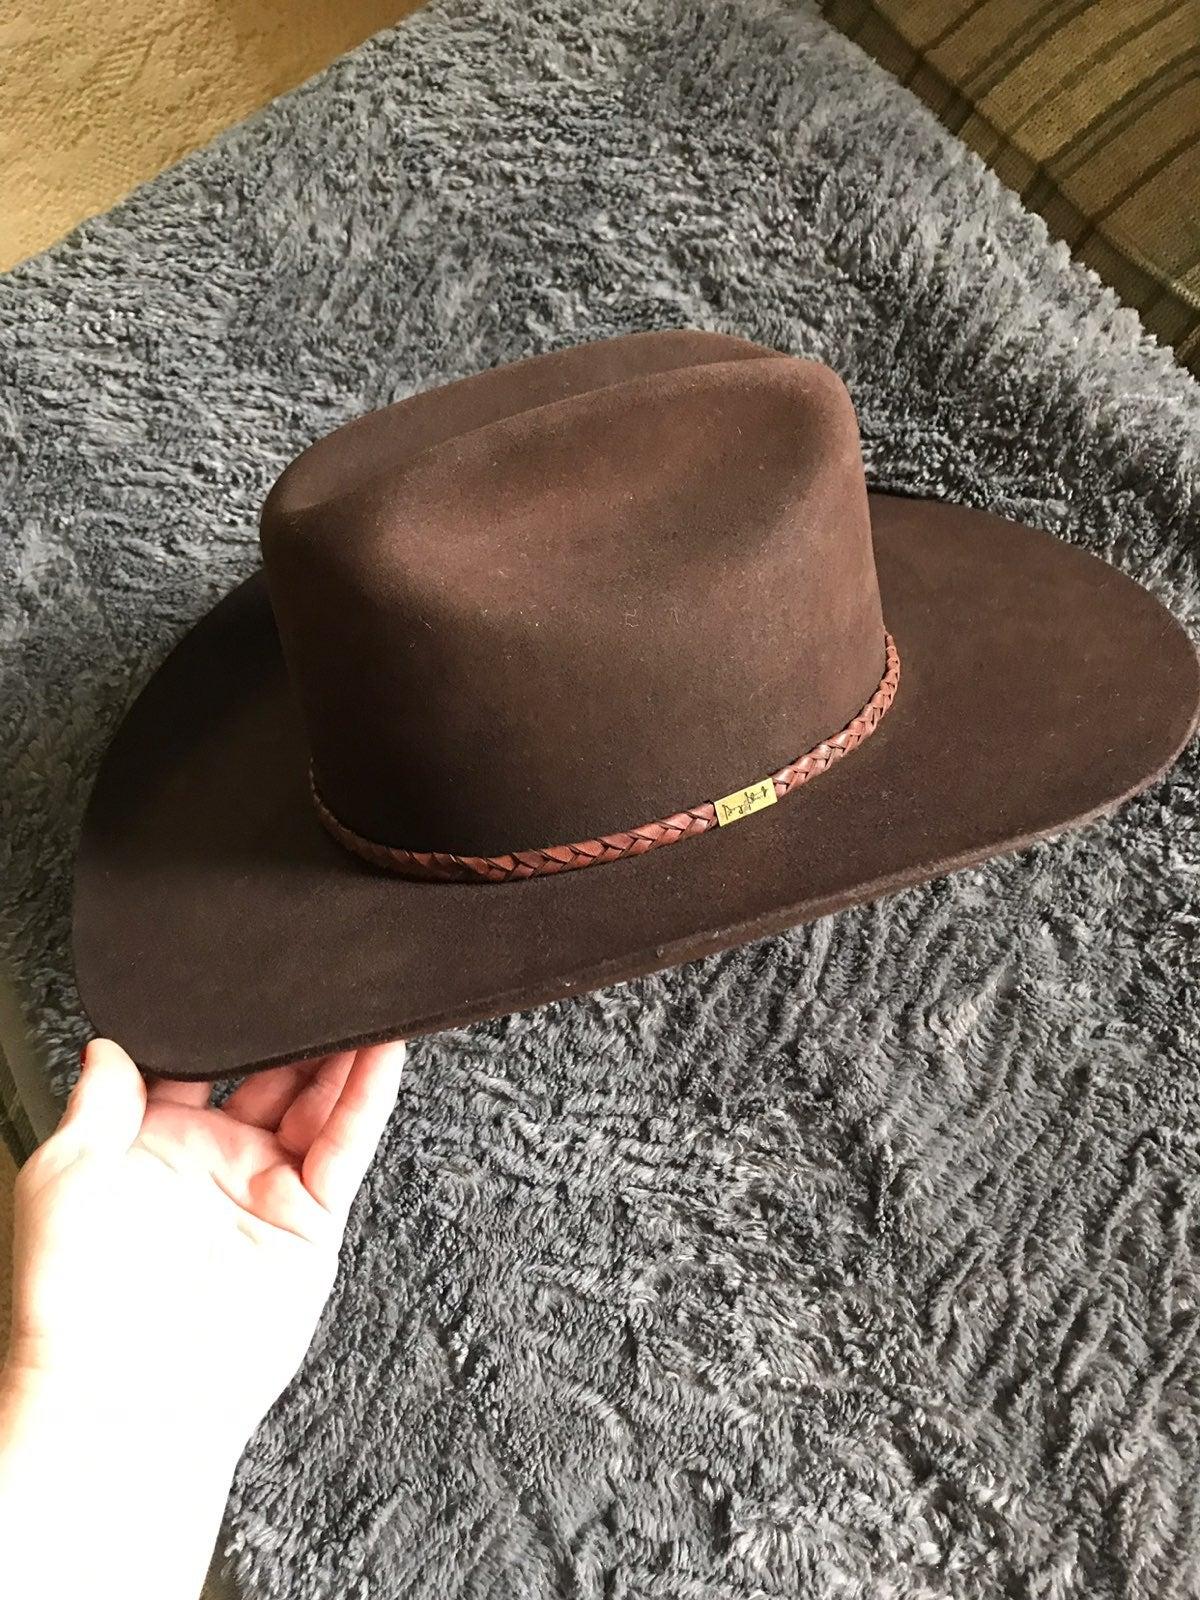 Resistol George Strait Cowboy Hat